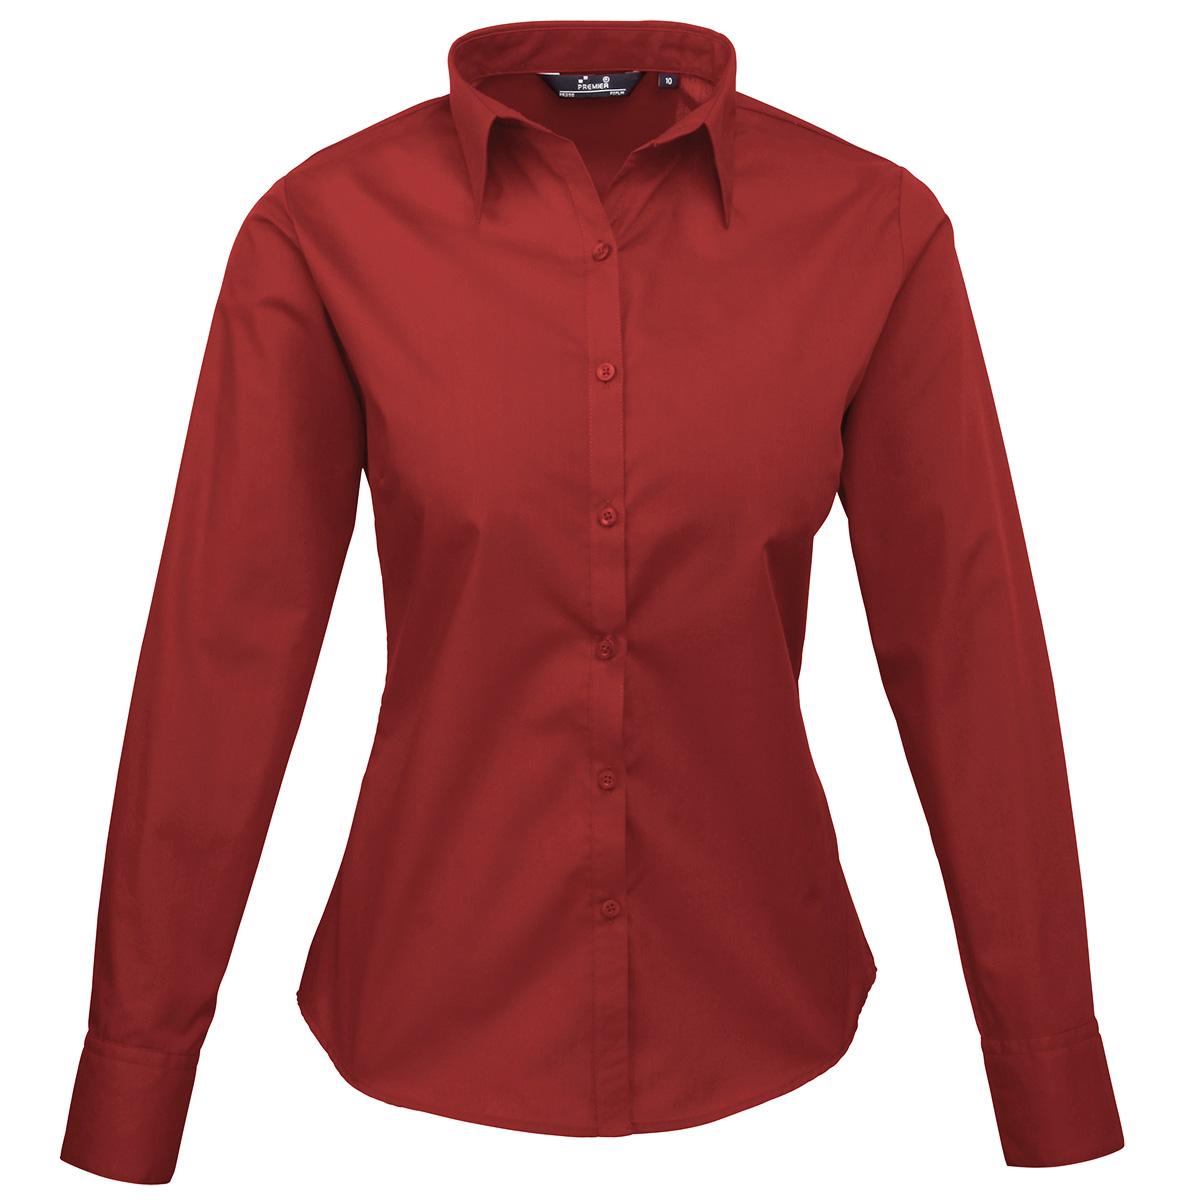 Burgundy Long Sleeve Blouse 31